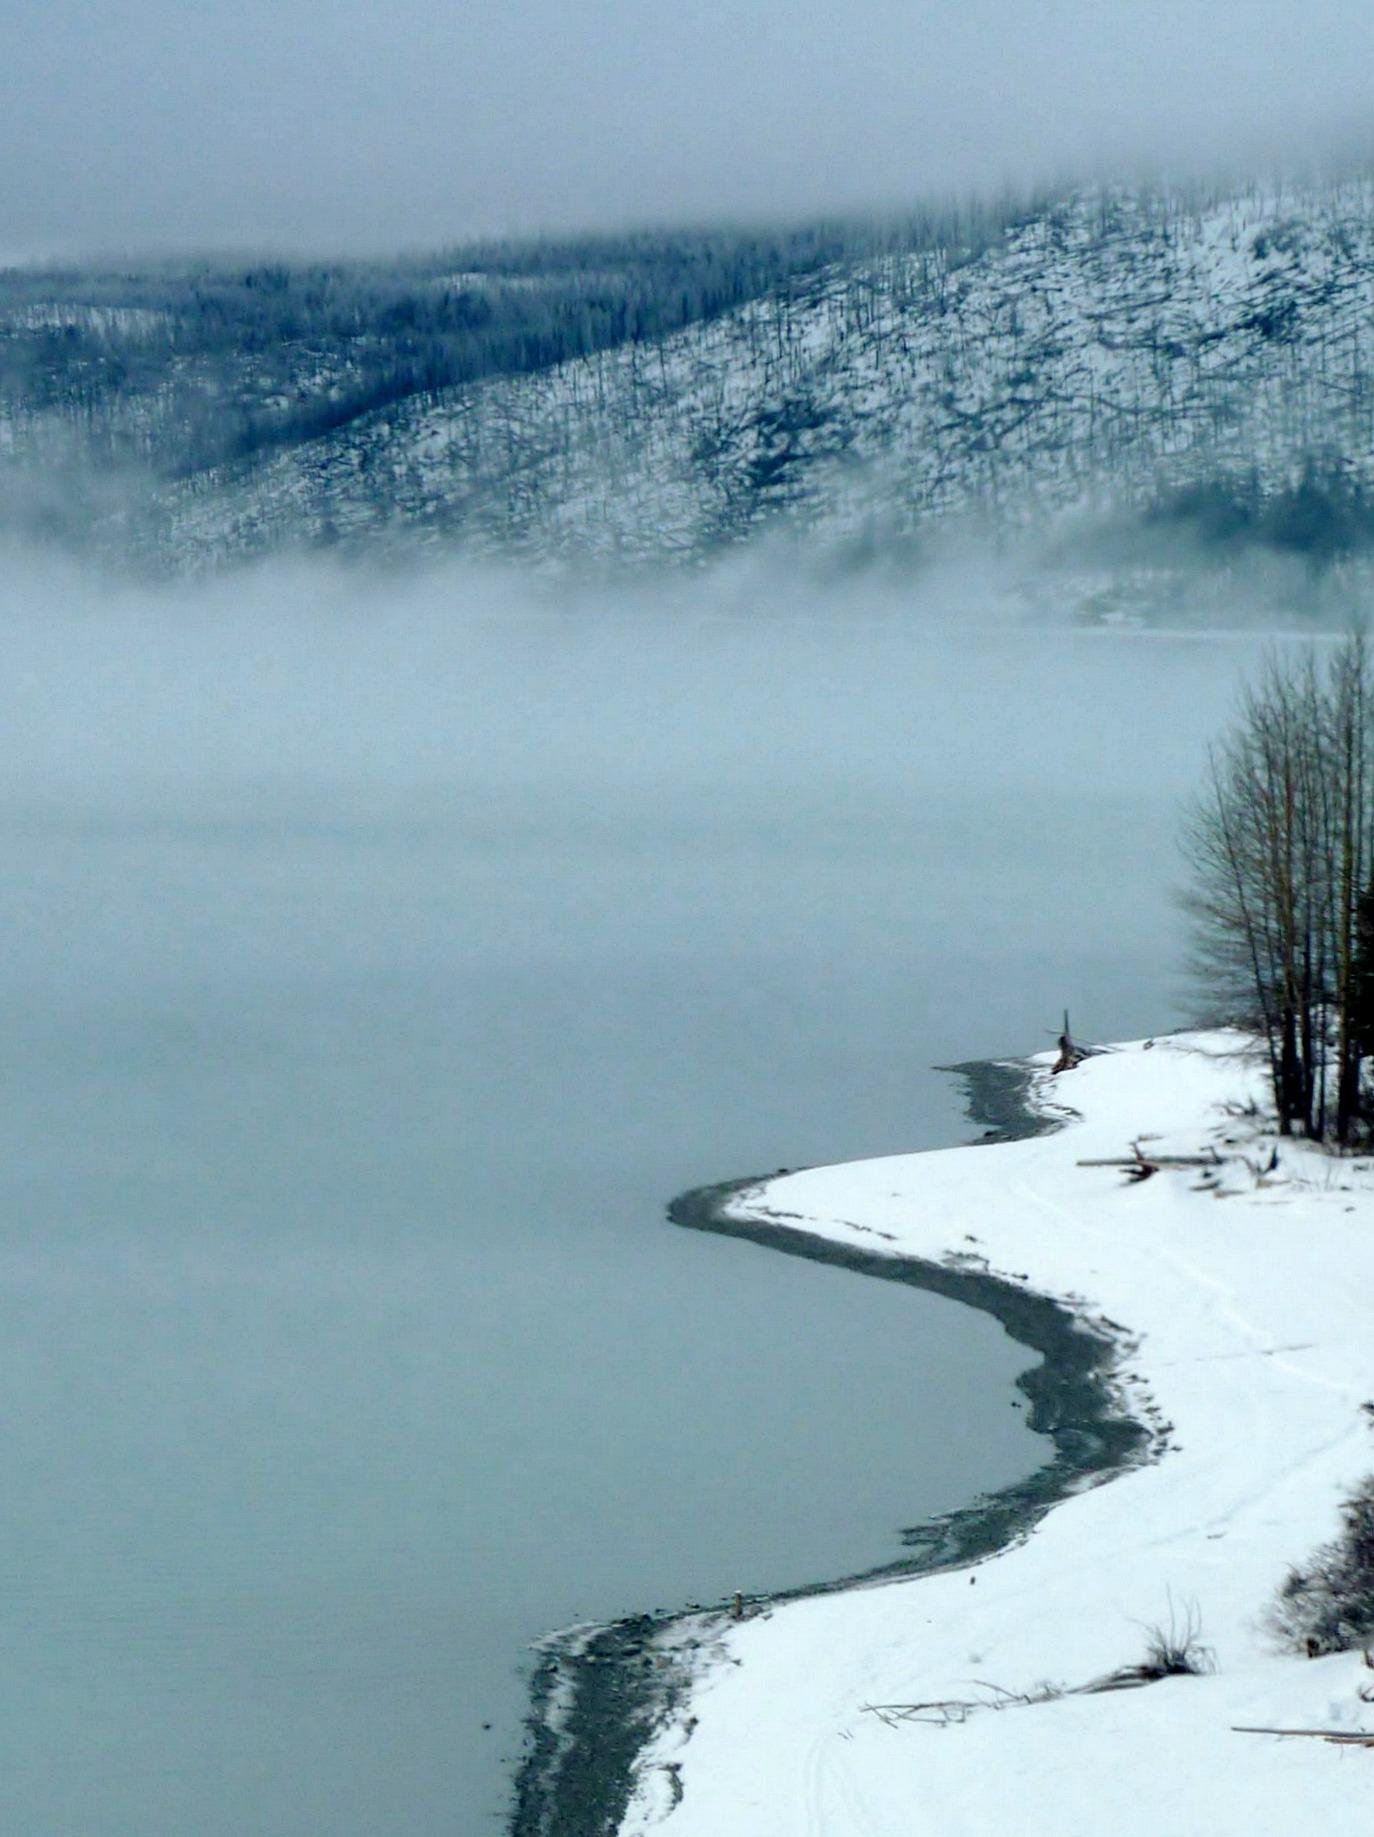 The Alaskan Frontier - The Exploress